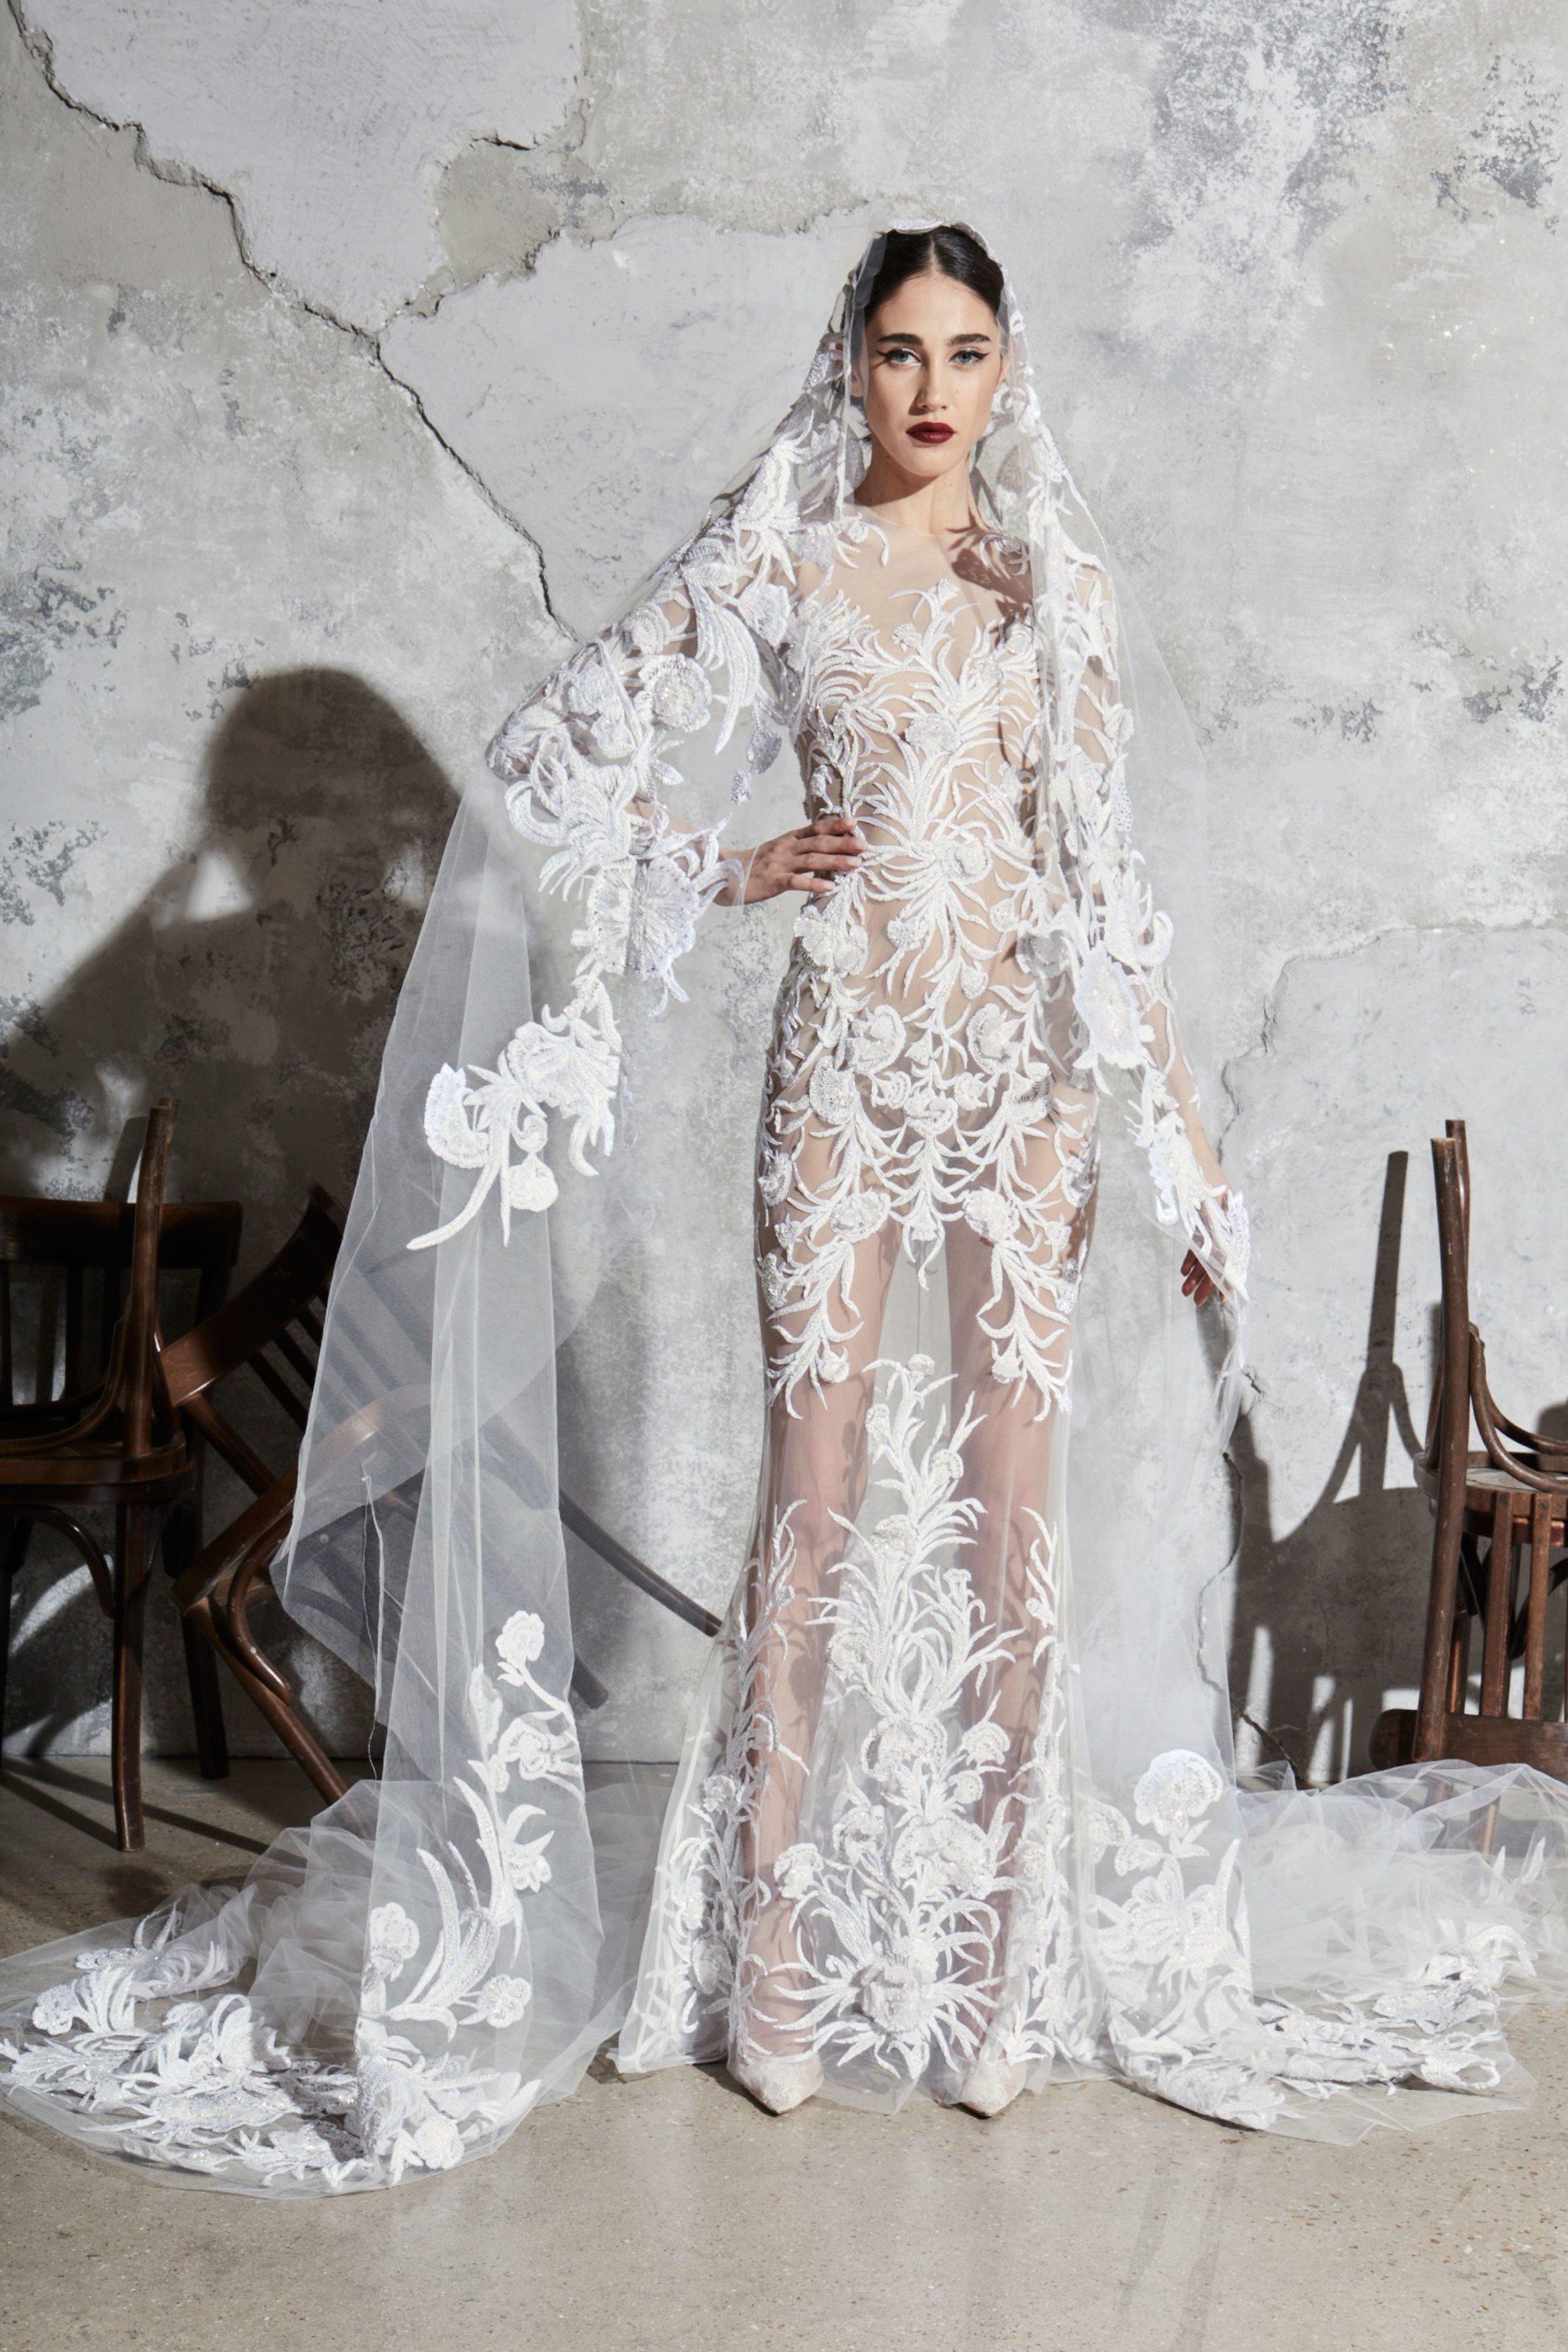 00012-zuhair-murad-new-york-bridal-Spring-2020-CREDIT-Thomas-Nutzl.jpg